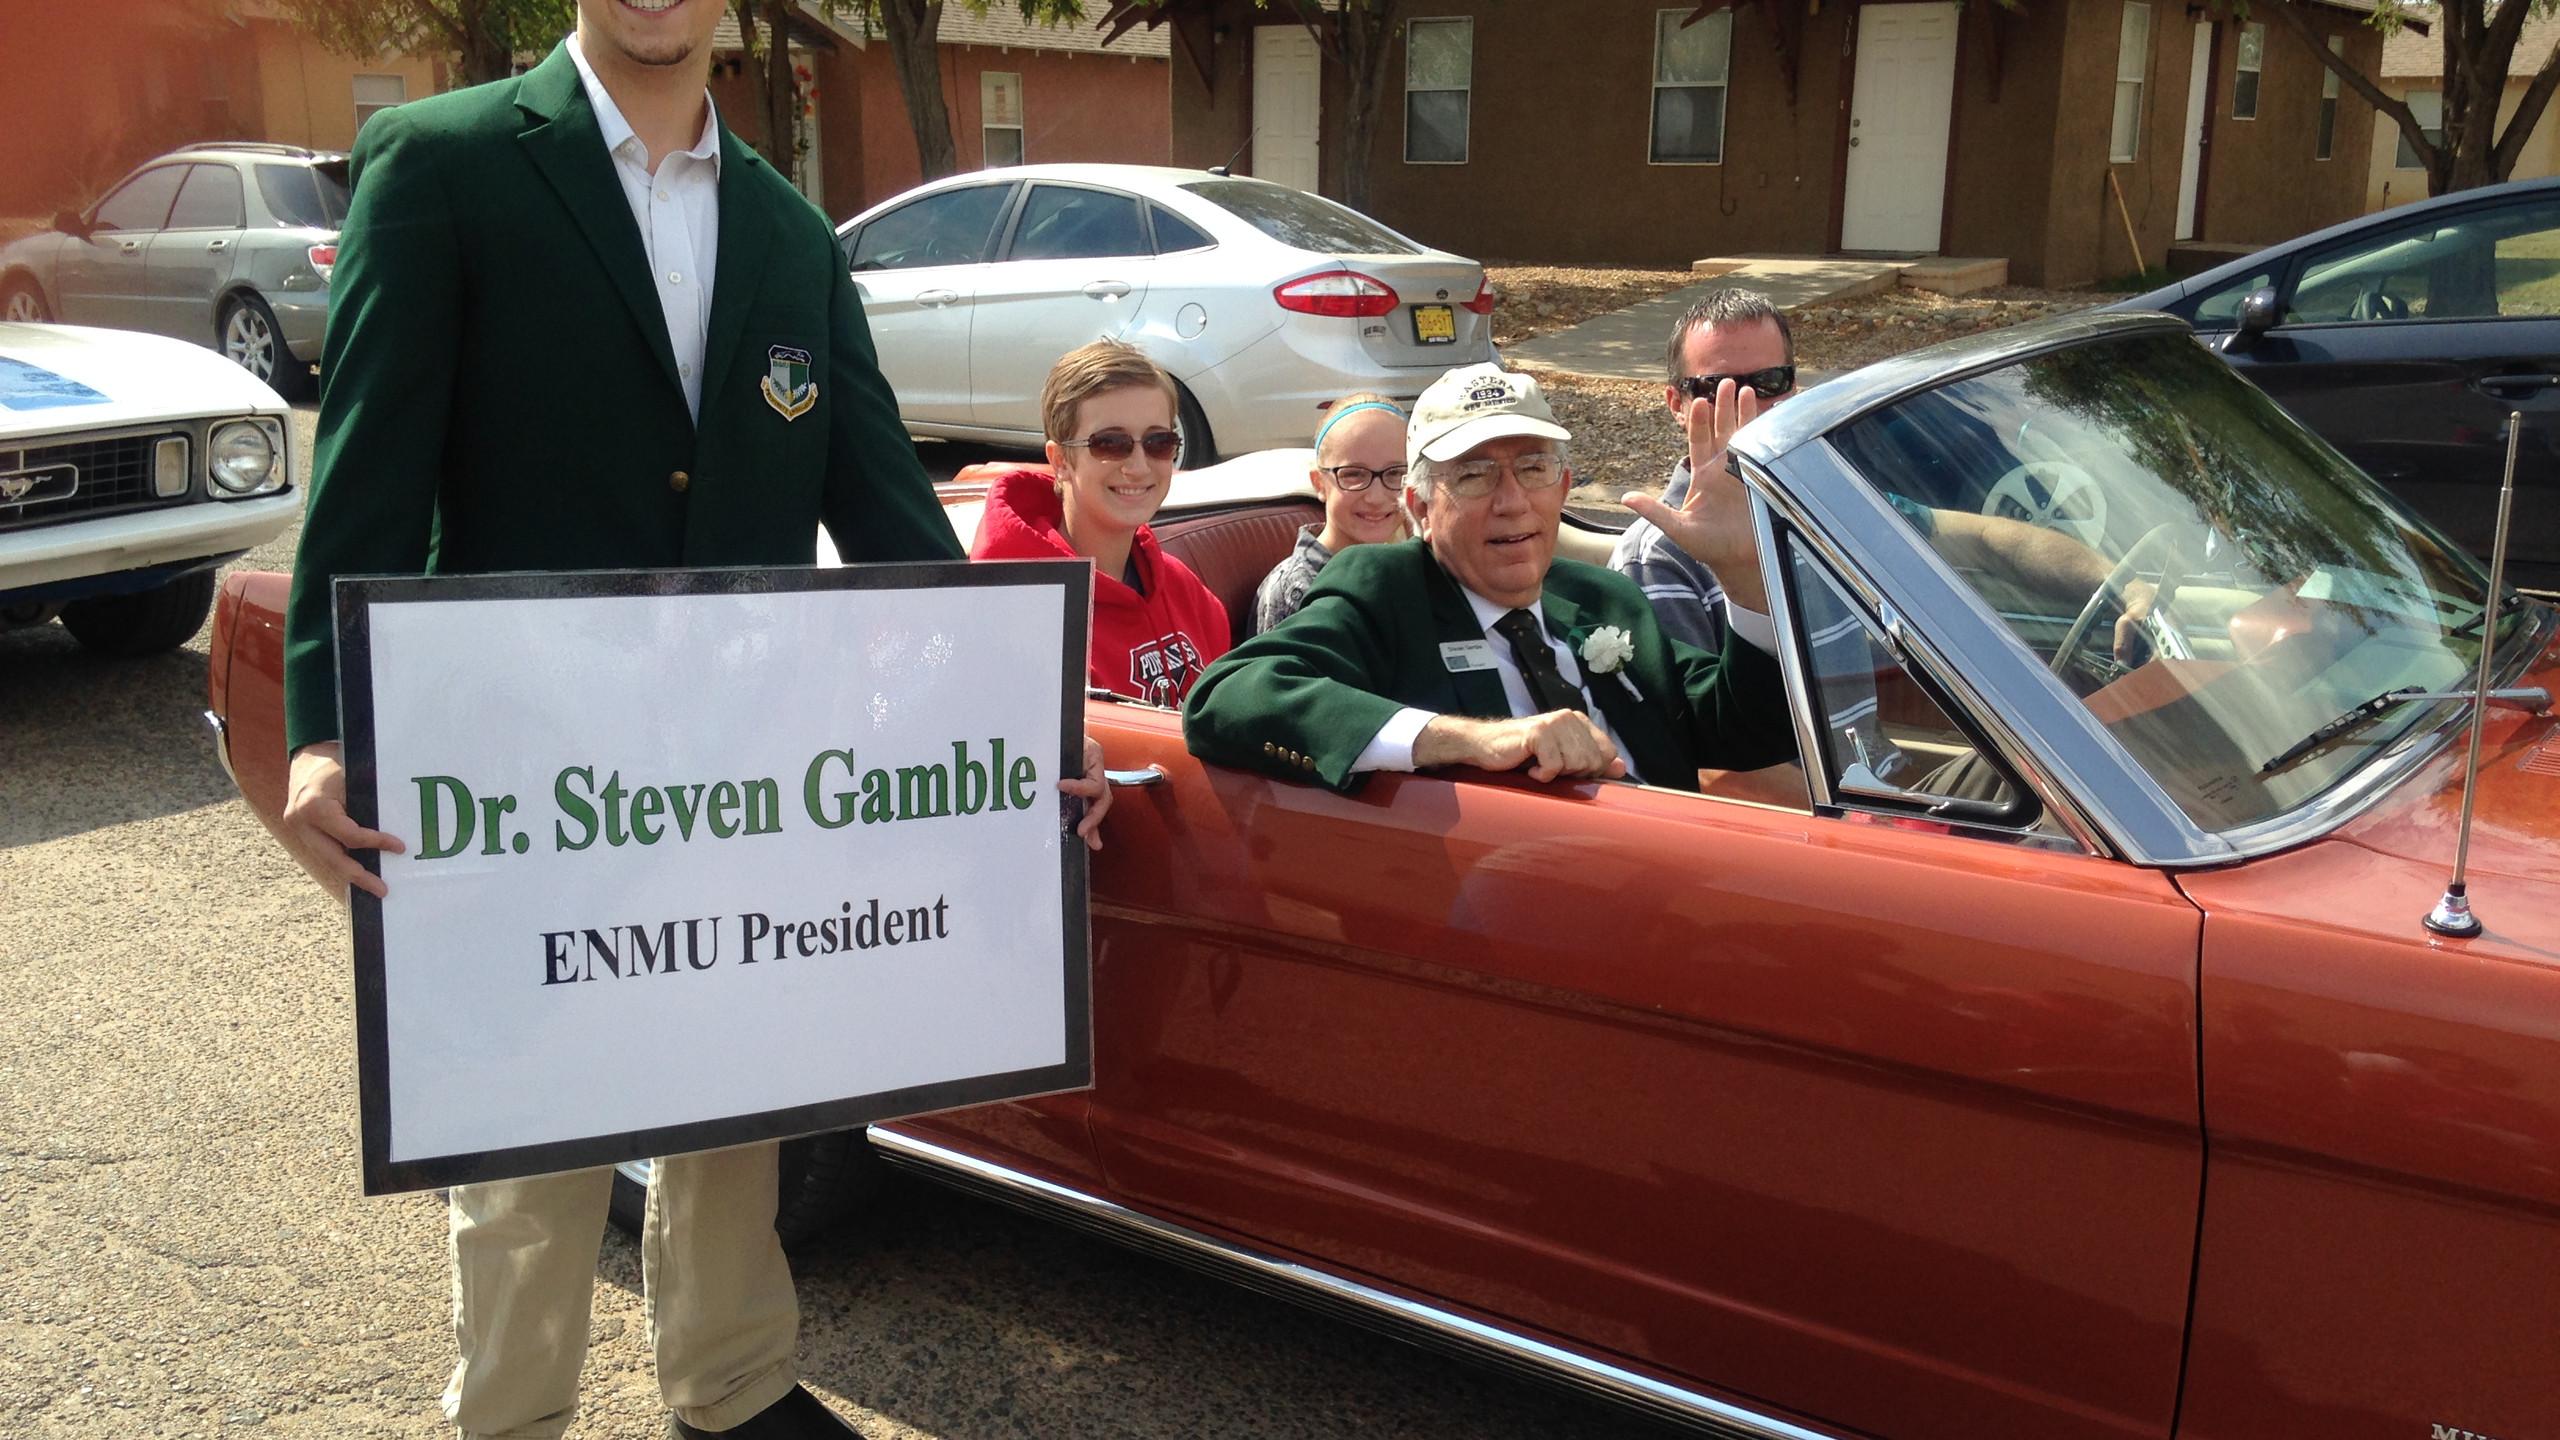 President Ambassador with Dr. Gamble